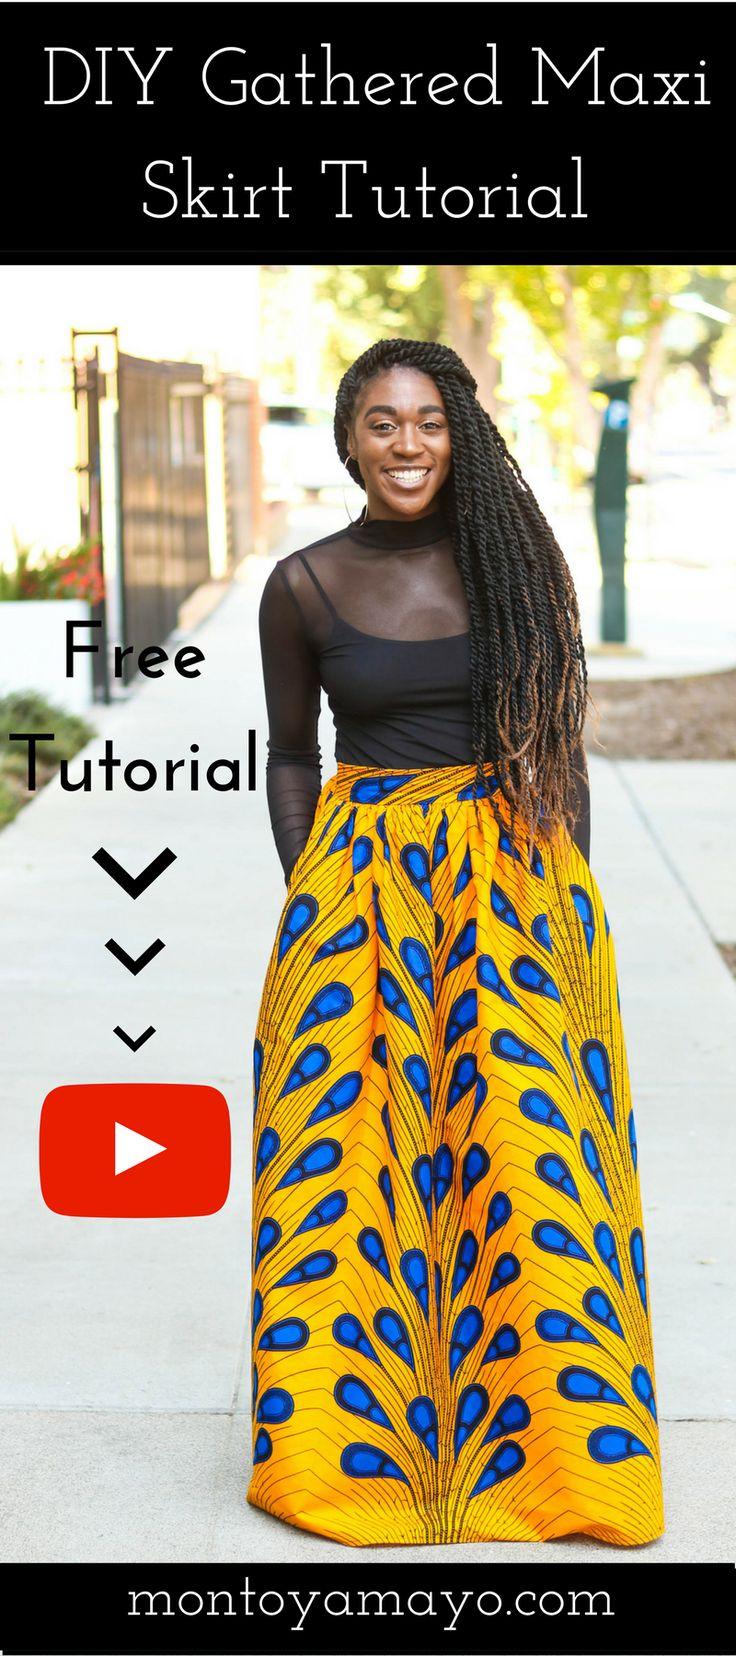 DIY | How To Sew Ankara African Print Gathered Maxi Skirt Tutorial (McCall's 7355) African Print Fashion, African Print Skirt, DIY Skirt, How to sew a skirt, Gathered Maxi Skirt, skirt, sewing for beginners, sewing tutorials, Modern African Fashion, Ankara Skirt, Ankara Fashion, DIY Maxi Skirt, Maxi Skirt, Learn to Sew, DIY Fashion, Sewing Clothing, African fashion styles, Kitenge, Nigerian Style, Ghanaian fashion, Gele, African Wedding, African Women Dresses, Ankara